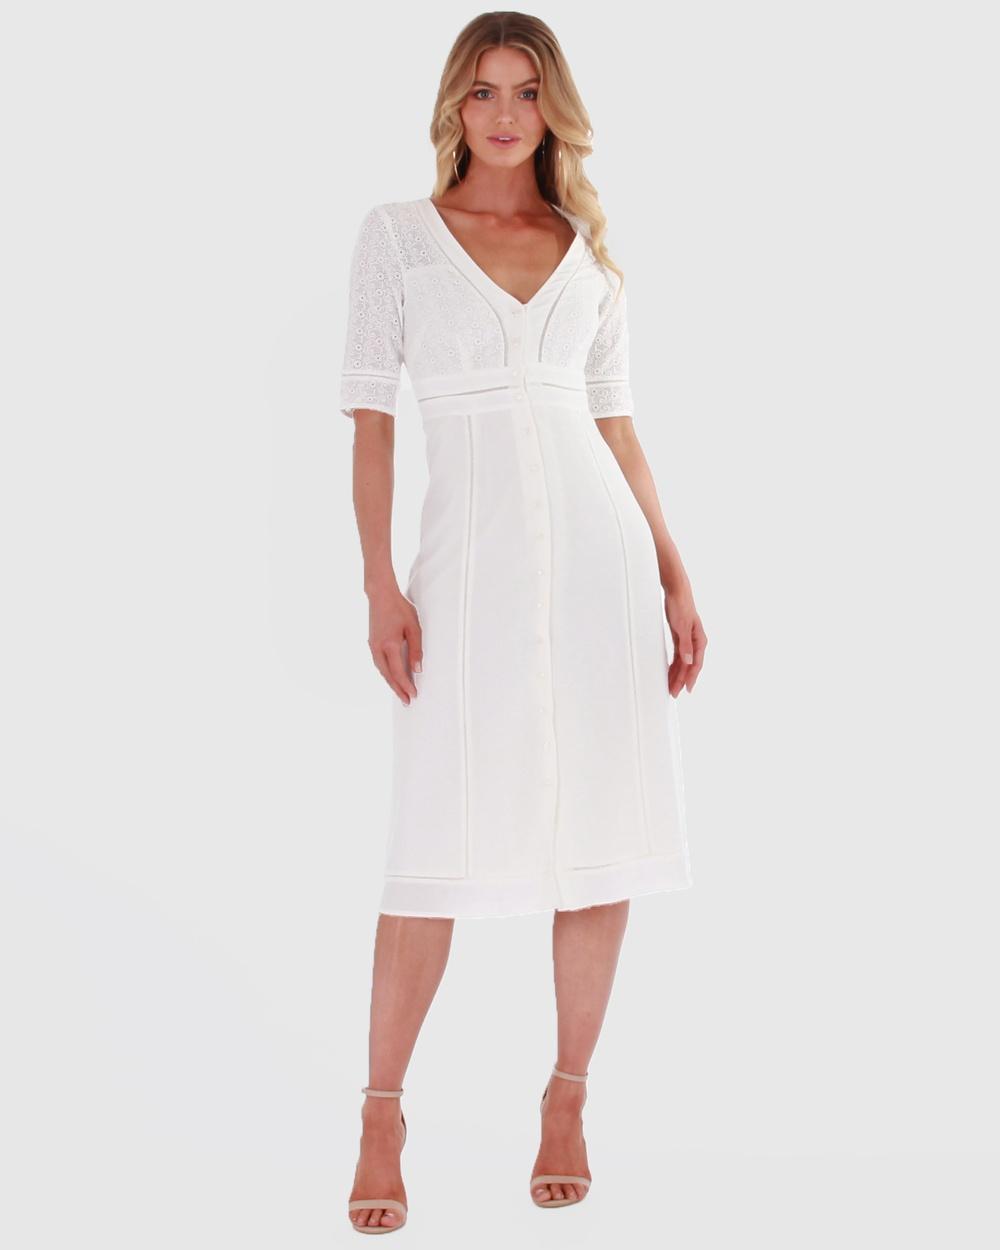 Amelius Etude Longline Dress Dresses White Etude Longline Dress